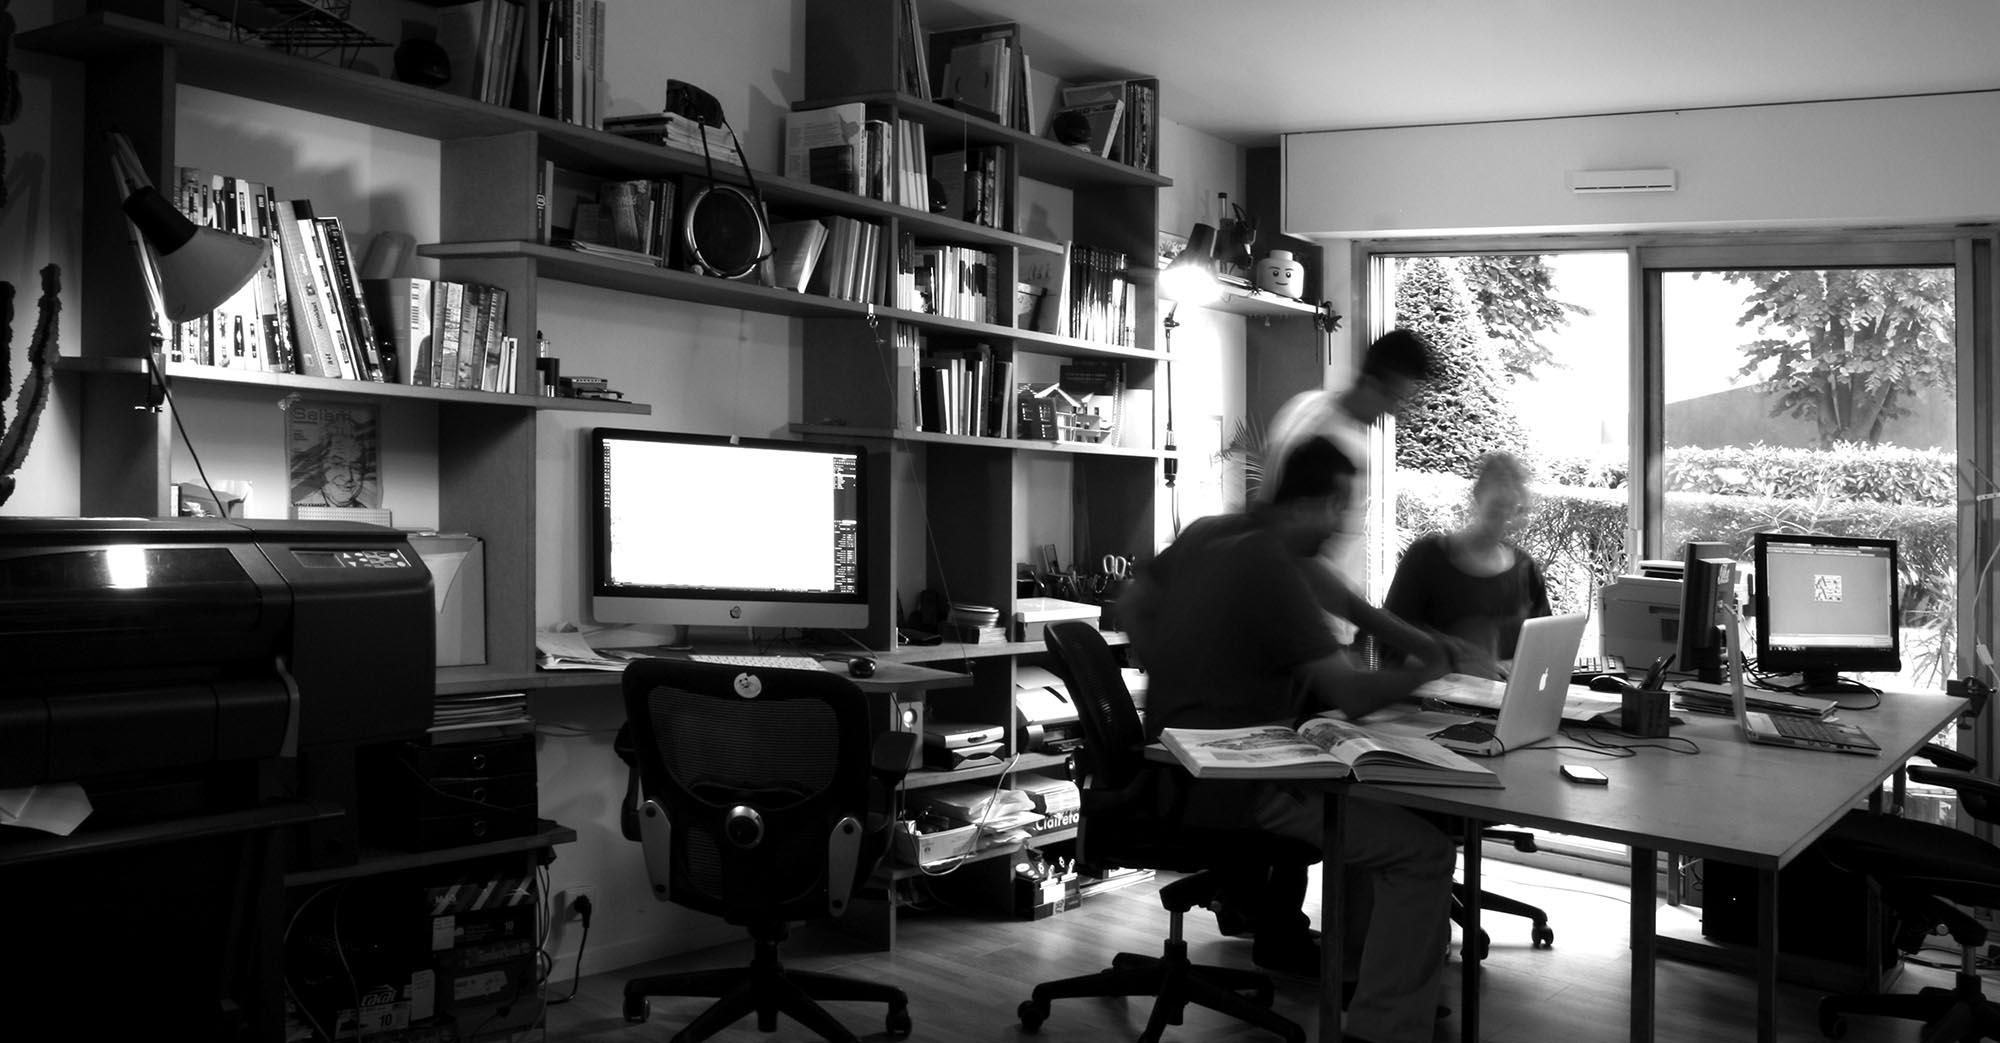 studio1984 AJAP 2014